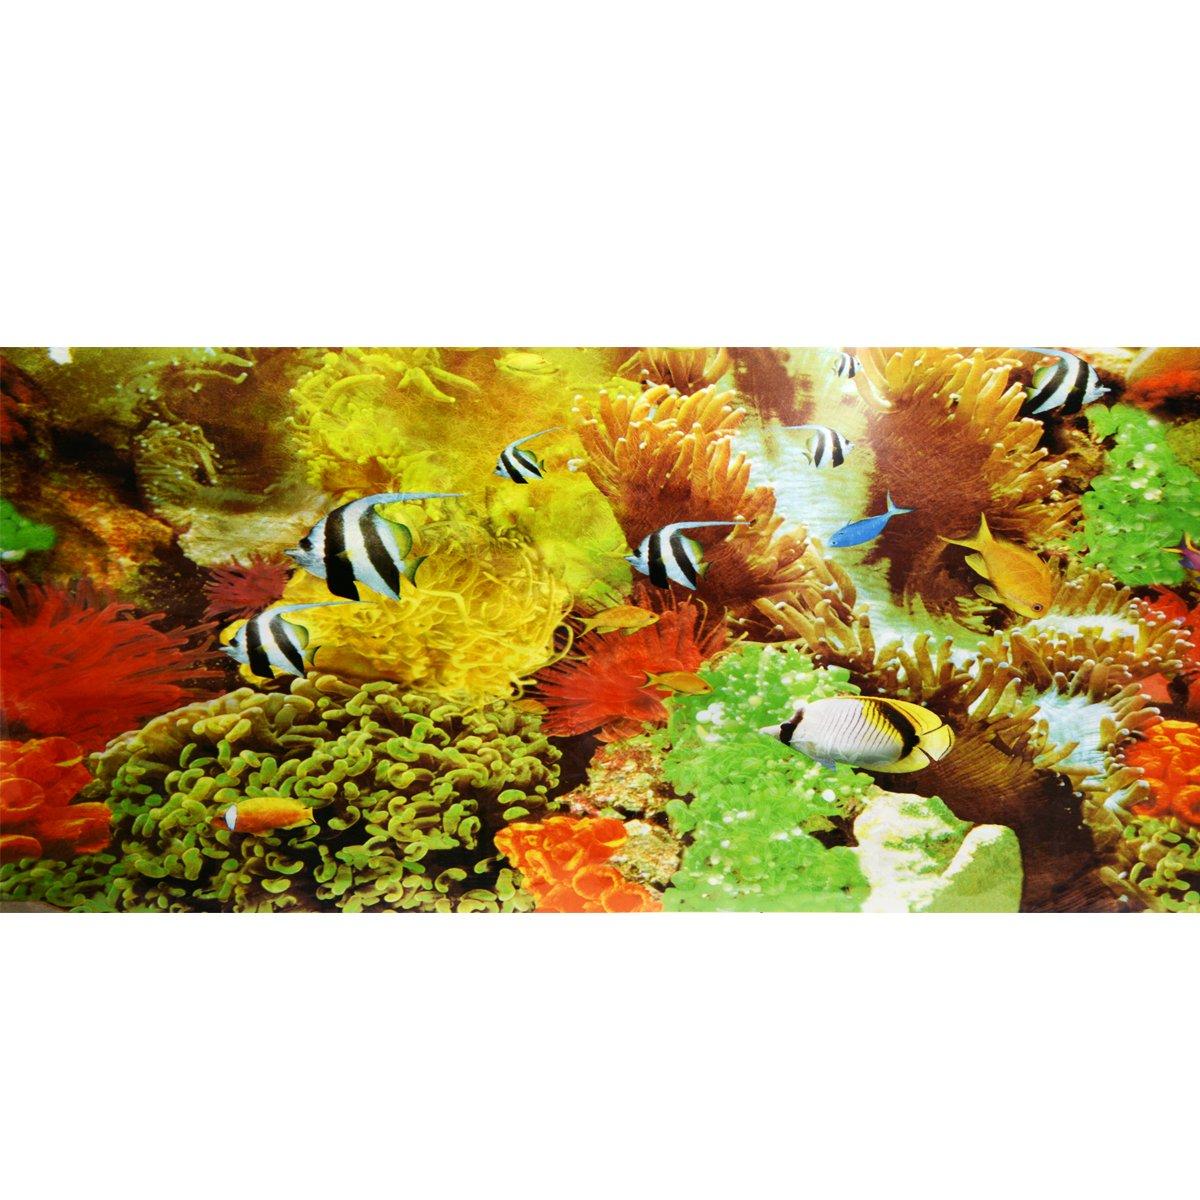 Saim Fond d'aquarium Poster double face Aquarium Fond Océan Mer/corail Fond d'aquarium E4YKSZ09042